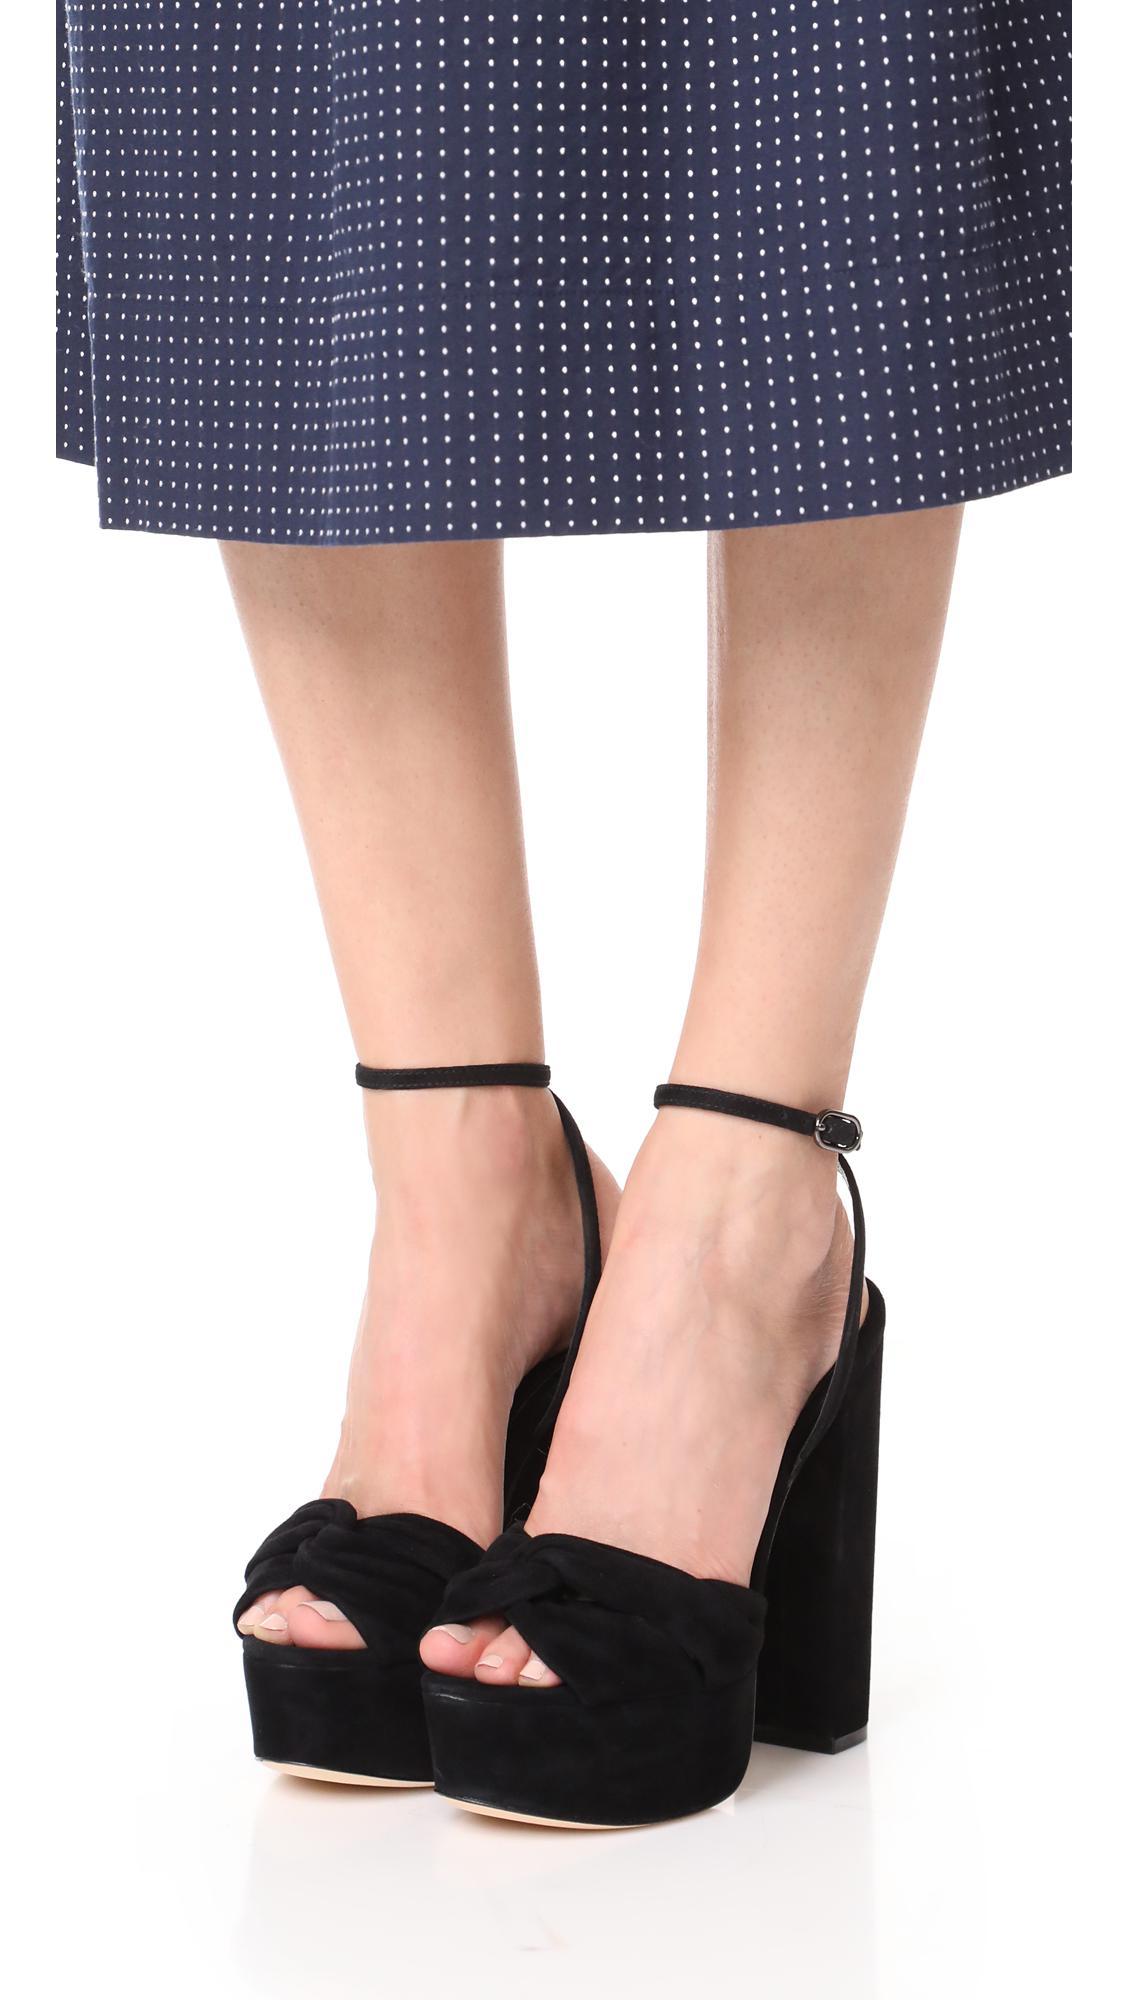 d6edd3140f5 Lyst - Rachel Zoe Claudette Platform Sandals in Black